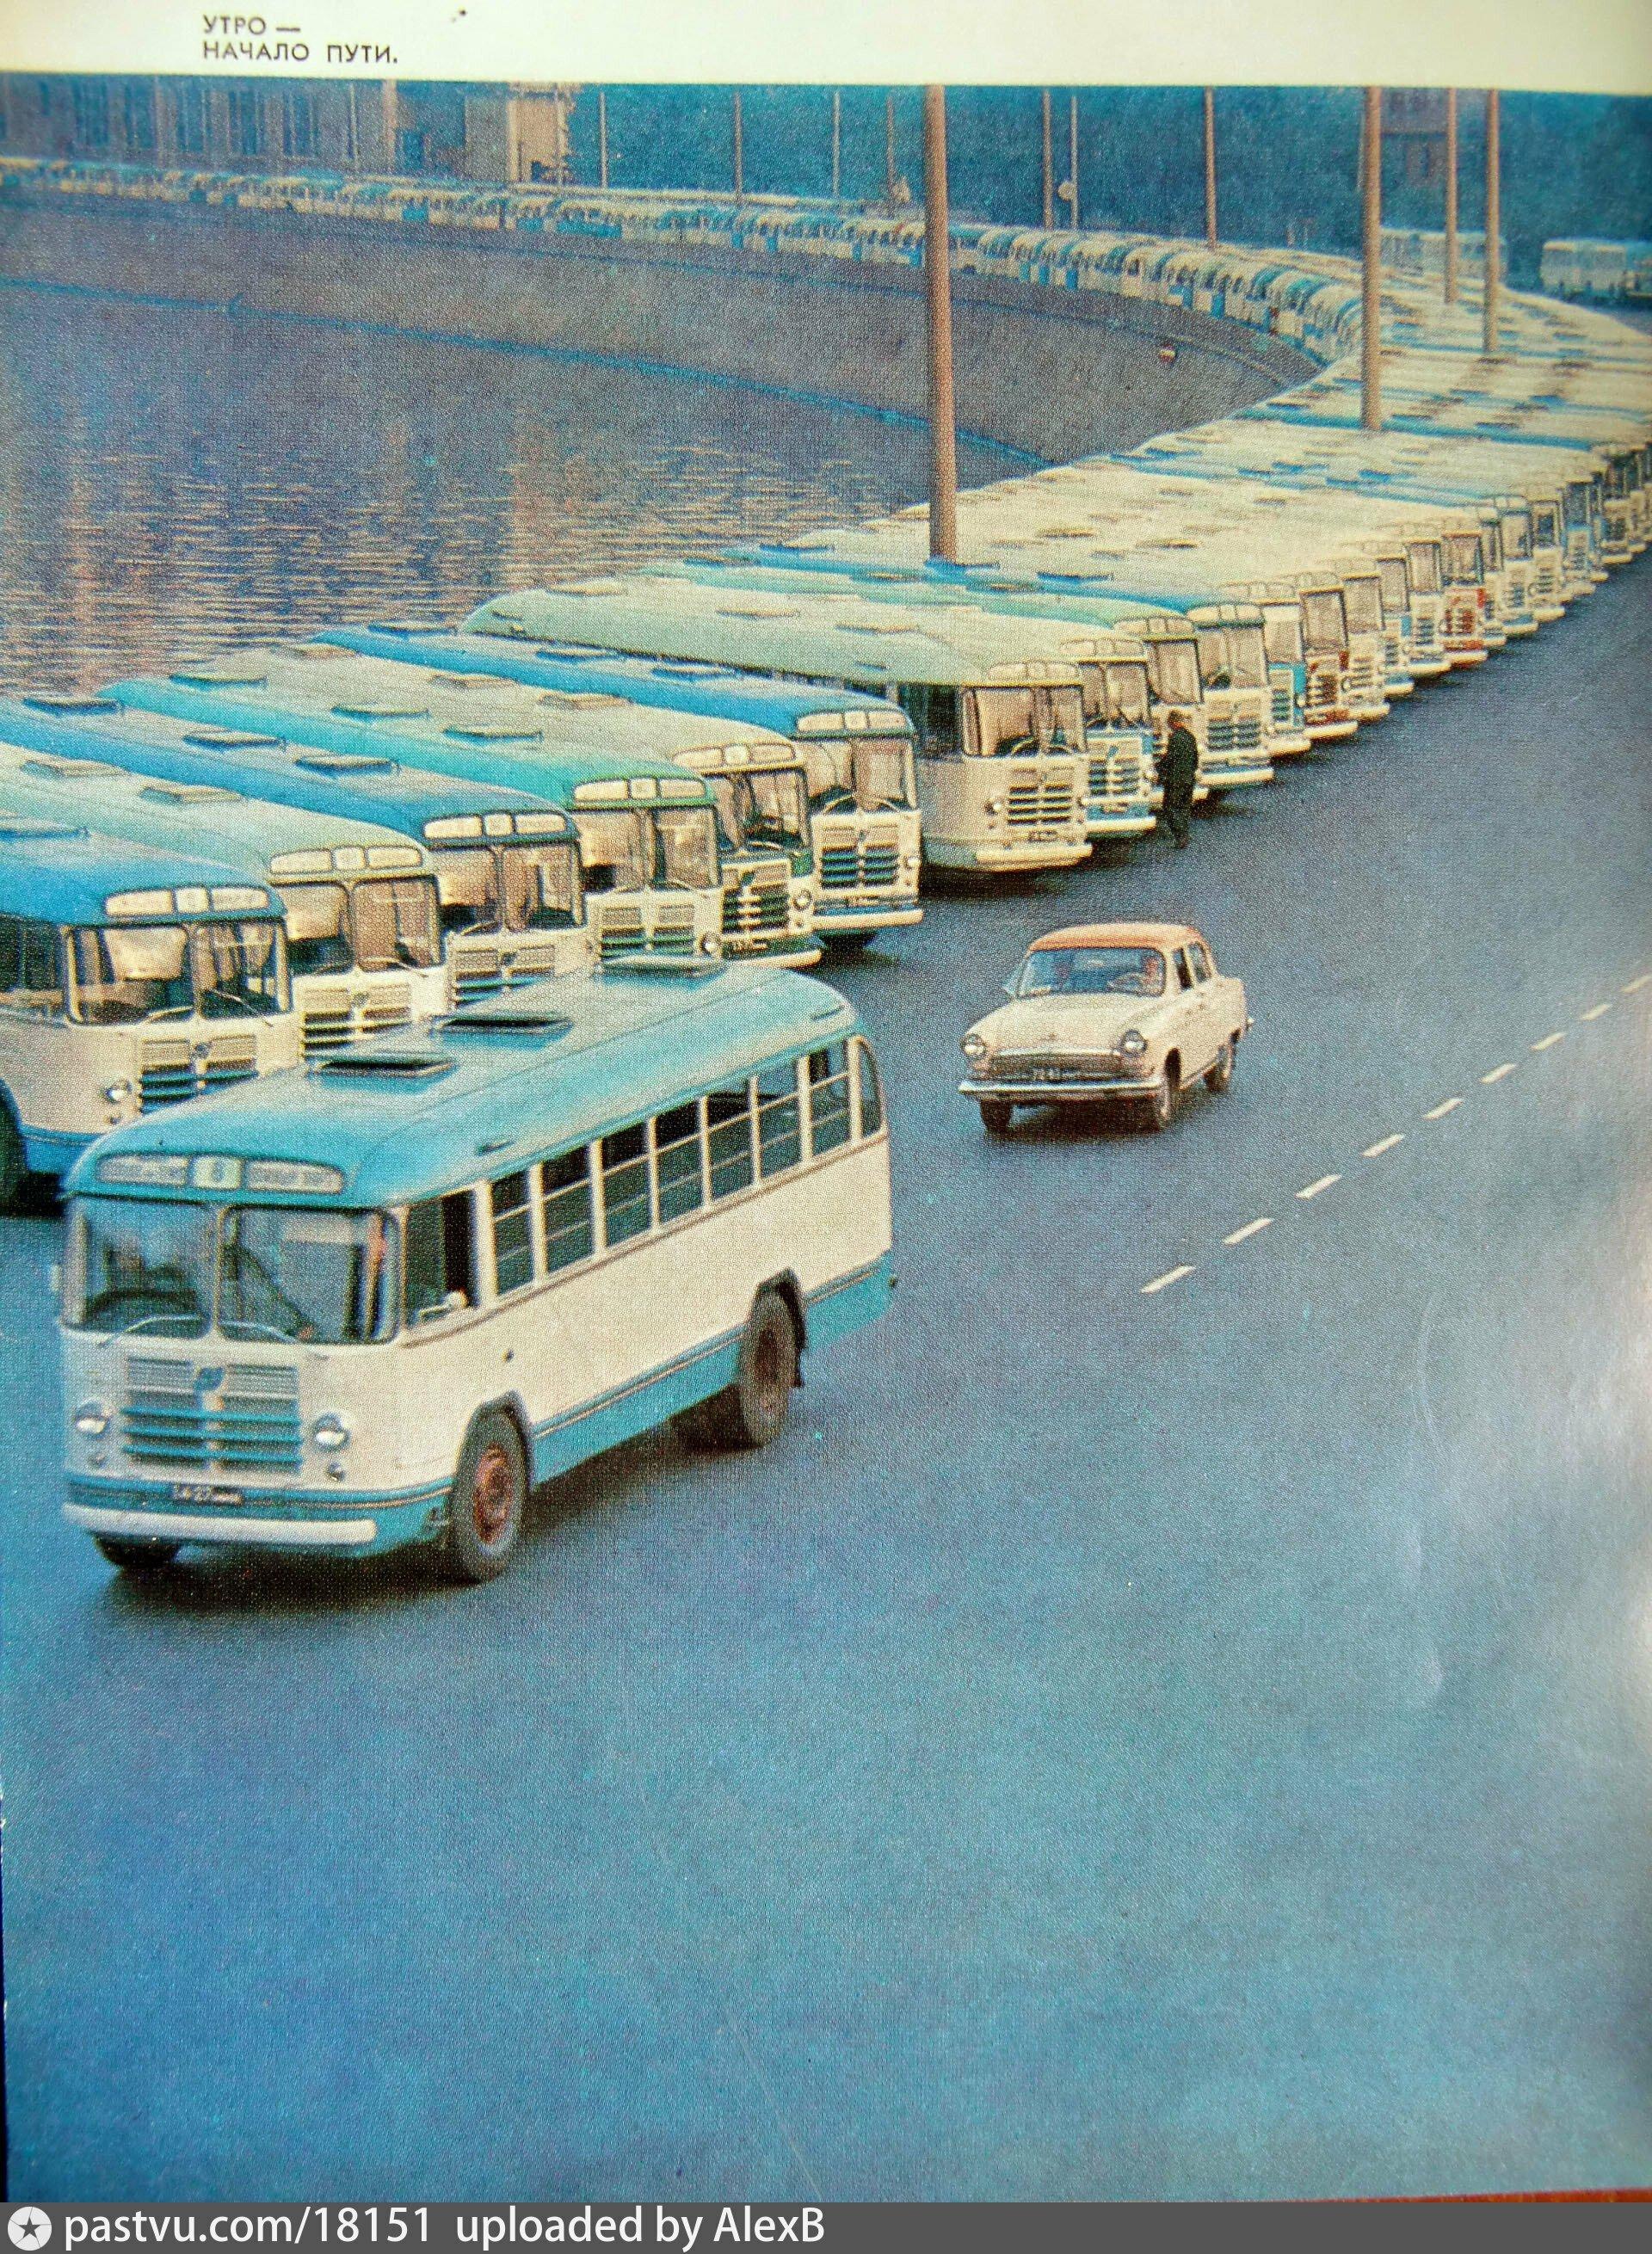 Советские автопредприятия москвы фото